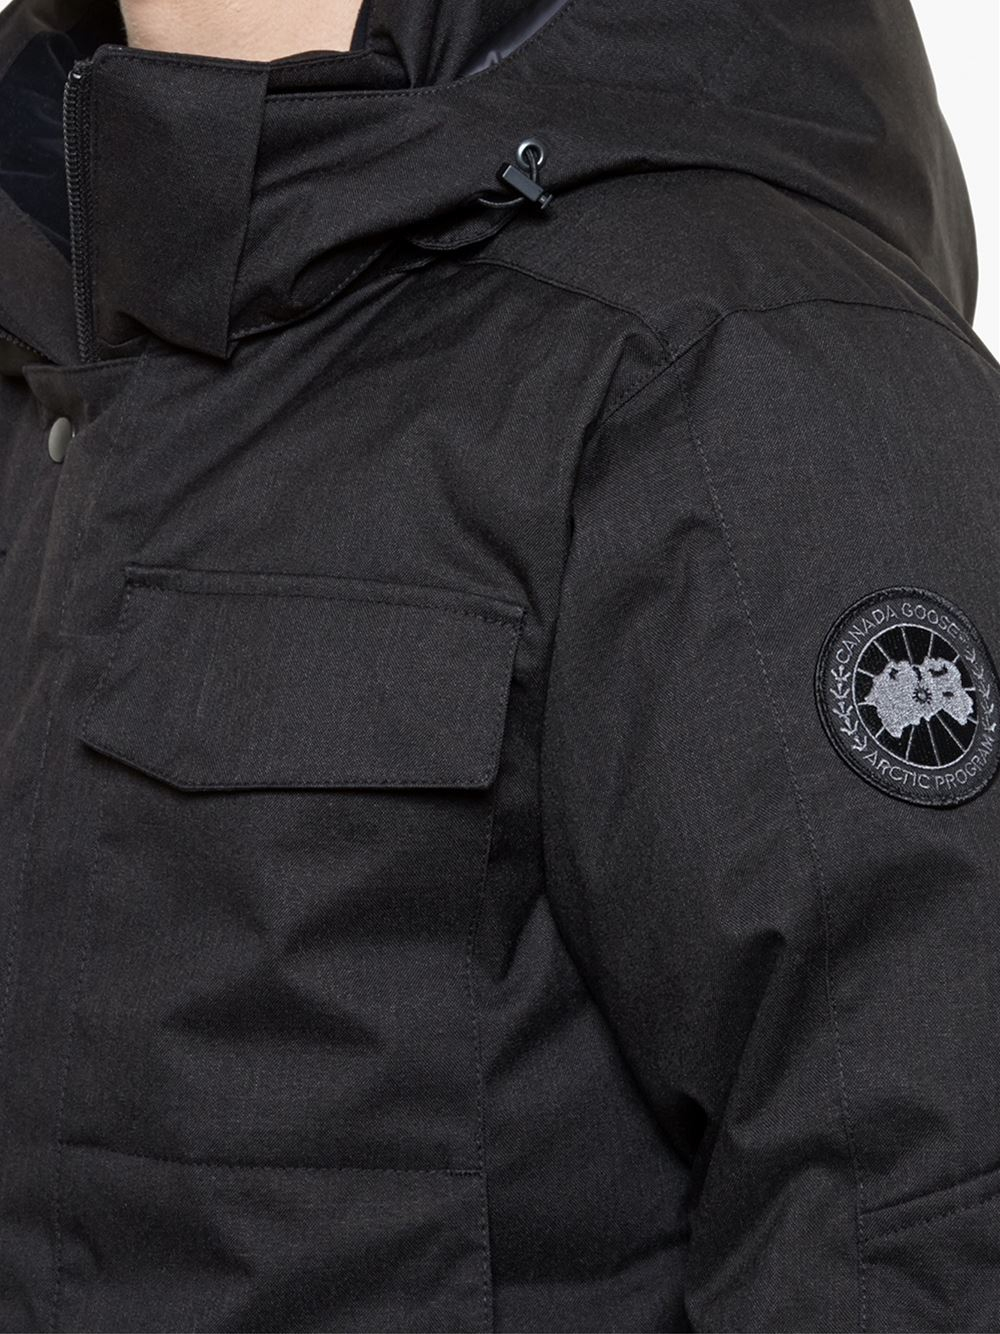 Canada Goose toronto online price - Canada goose 'branta Windermere' Coat in Black for Men | Lyst